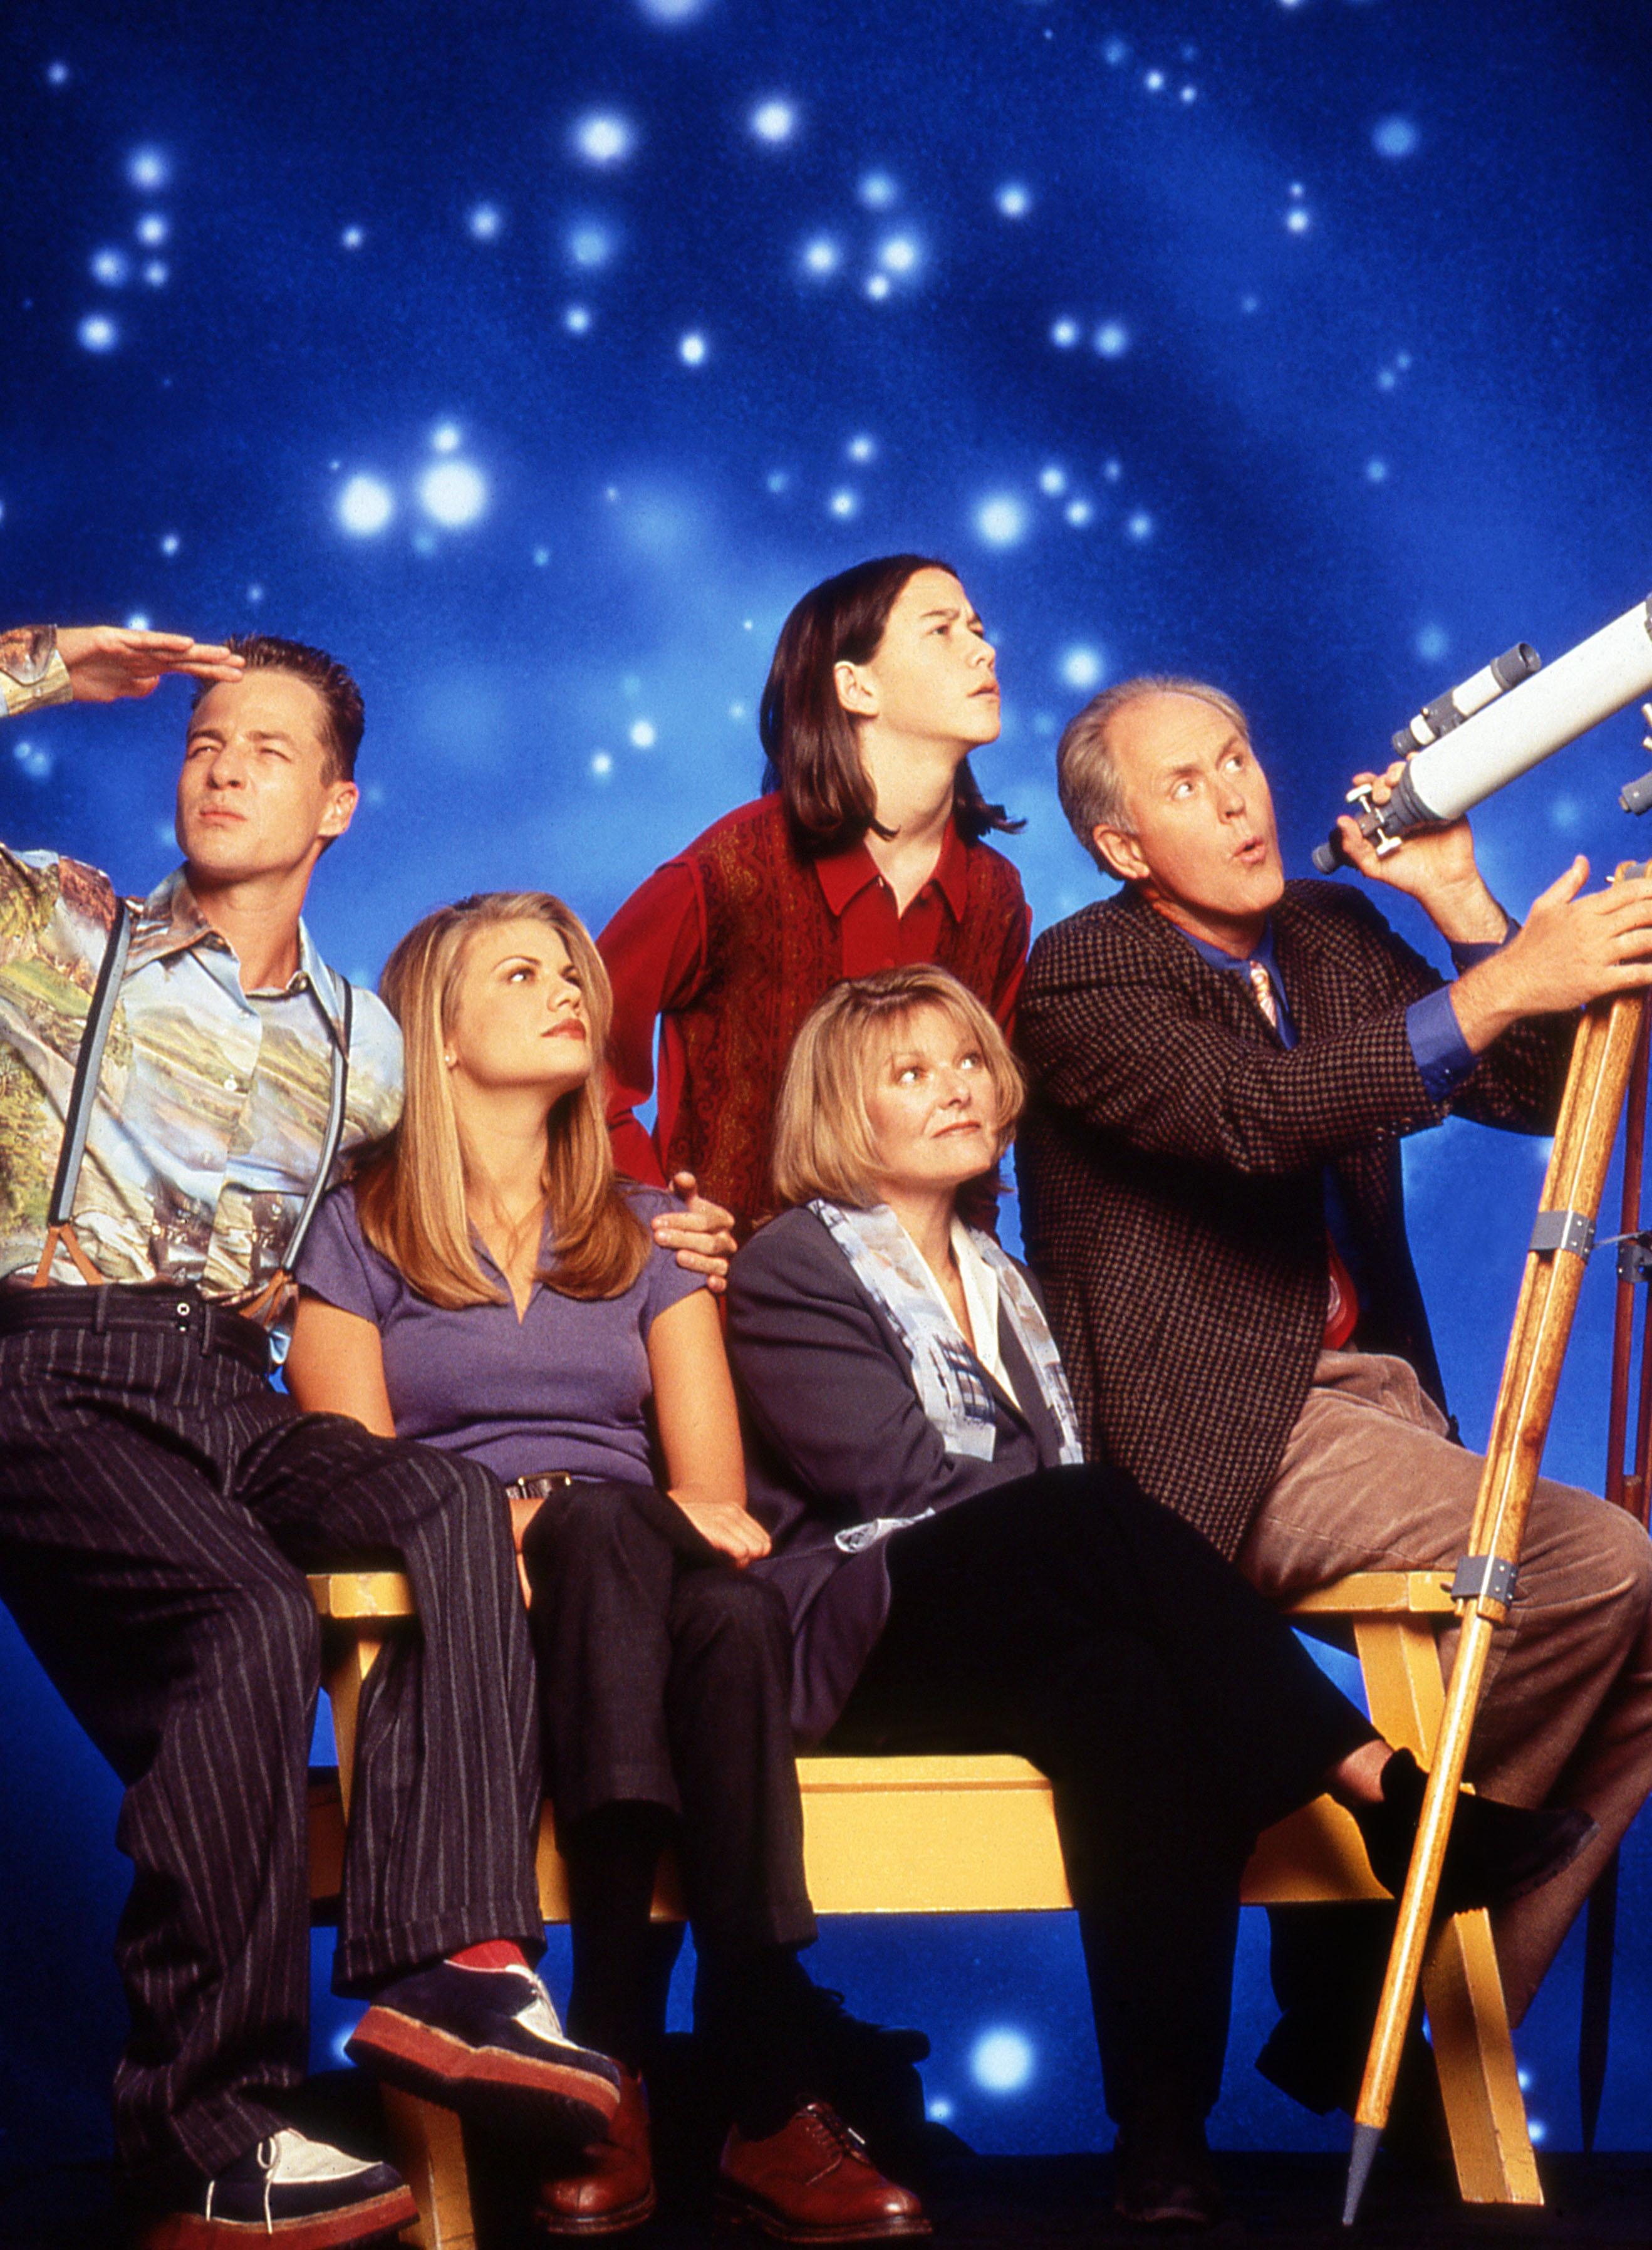 French Stewart, Kristen Johnston, Joseph Gordon-Levitt, Jane Curtin, John Lithgow, 3rd Rock From the Sun, 1996